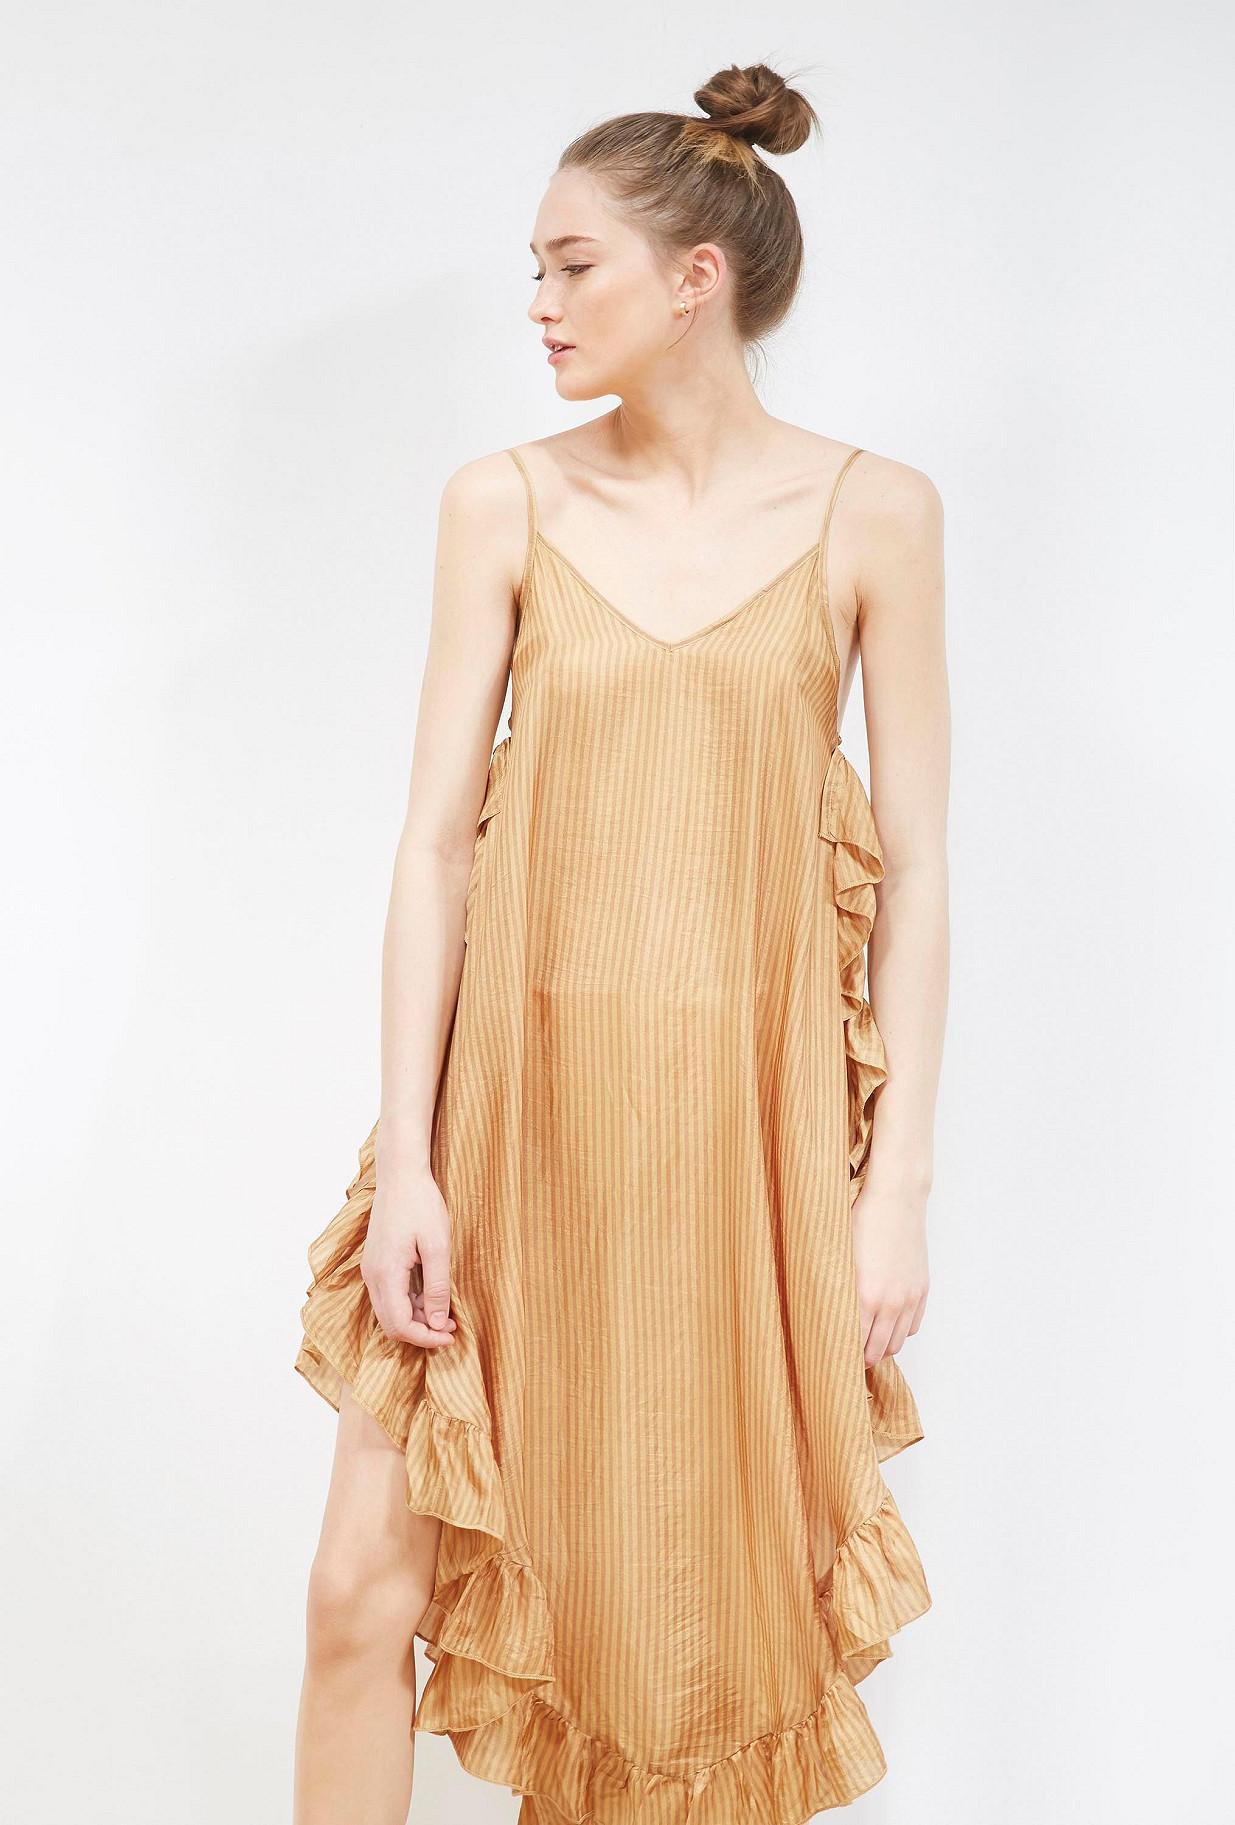 Honey DRESS Melodie